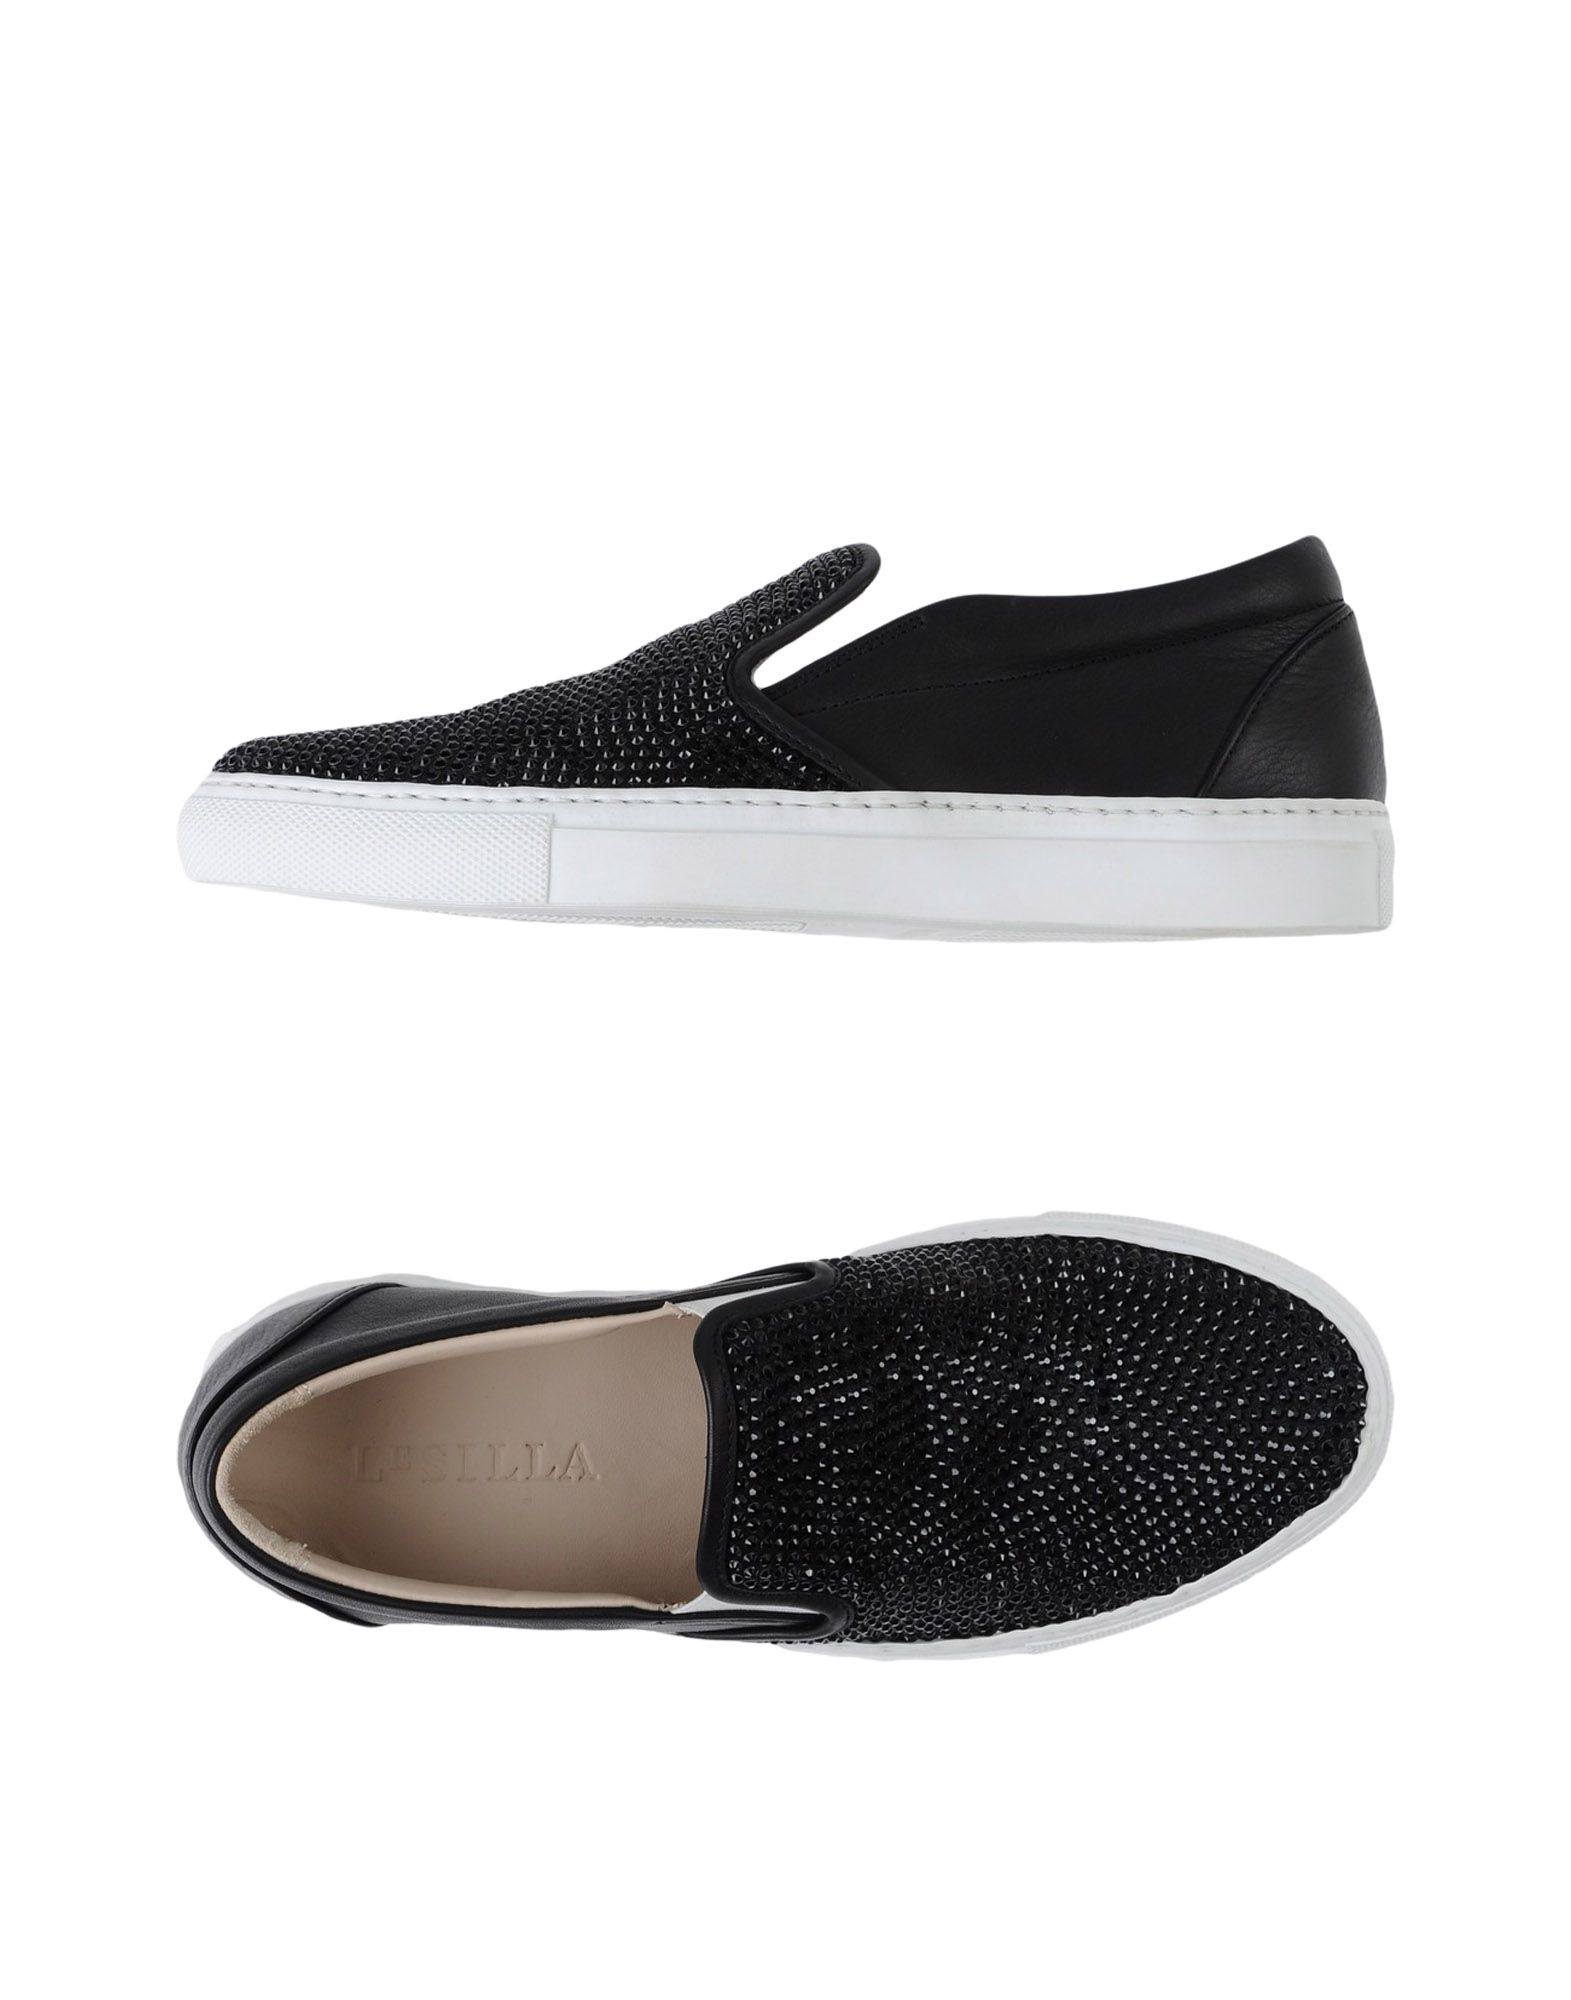 Sneakers Le Silla Femme - Sneakers Le Silla sur